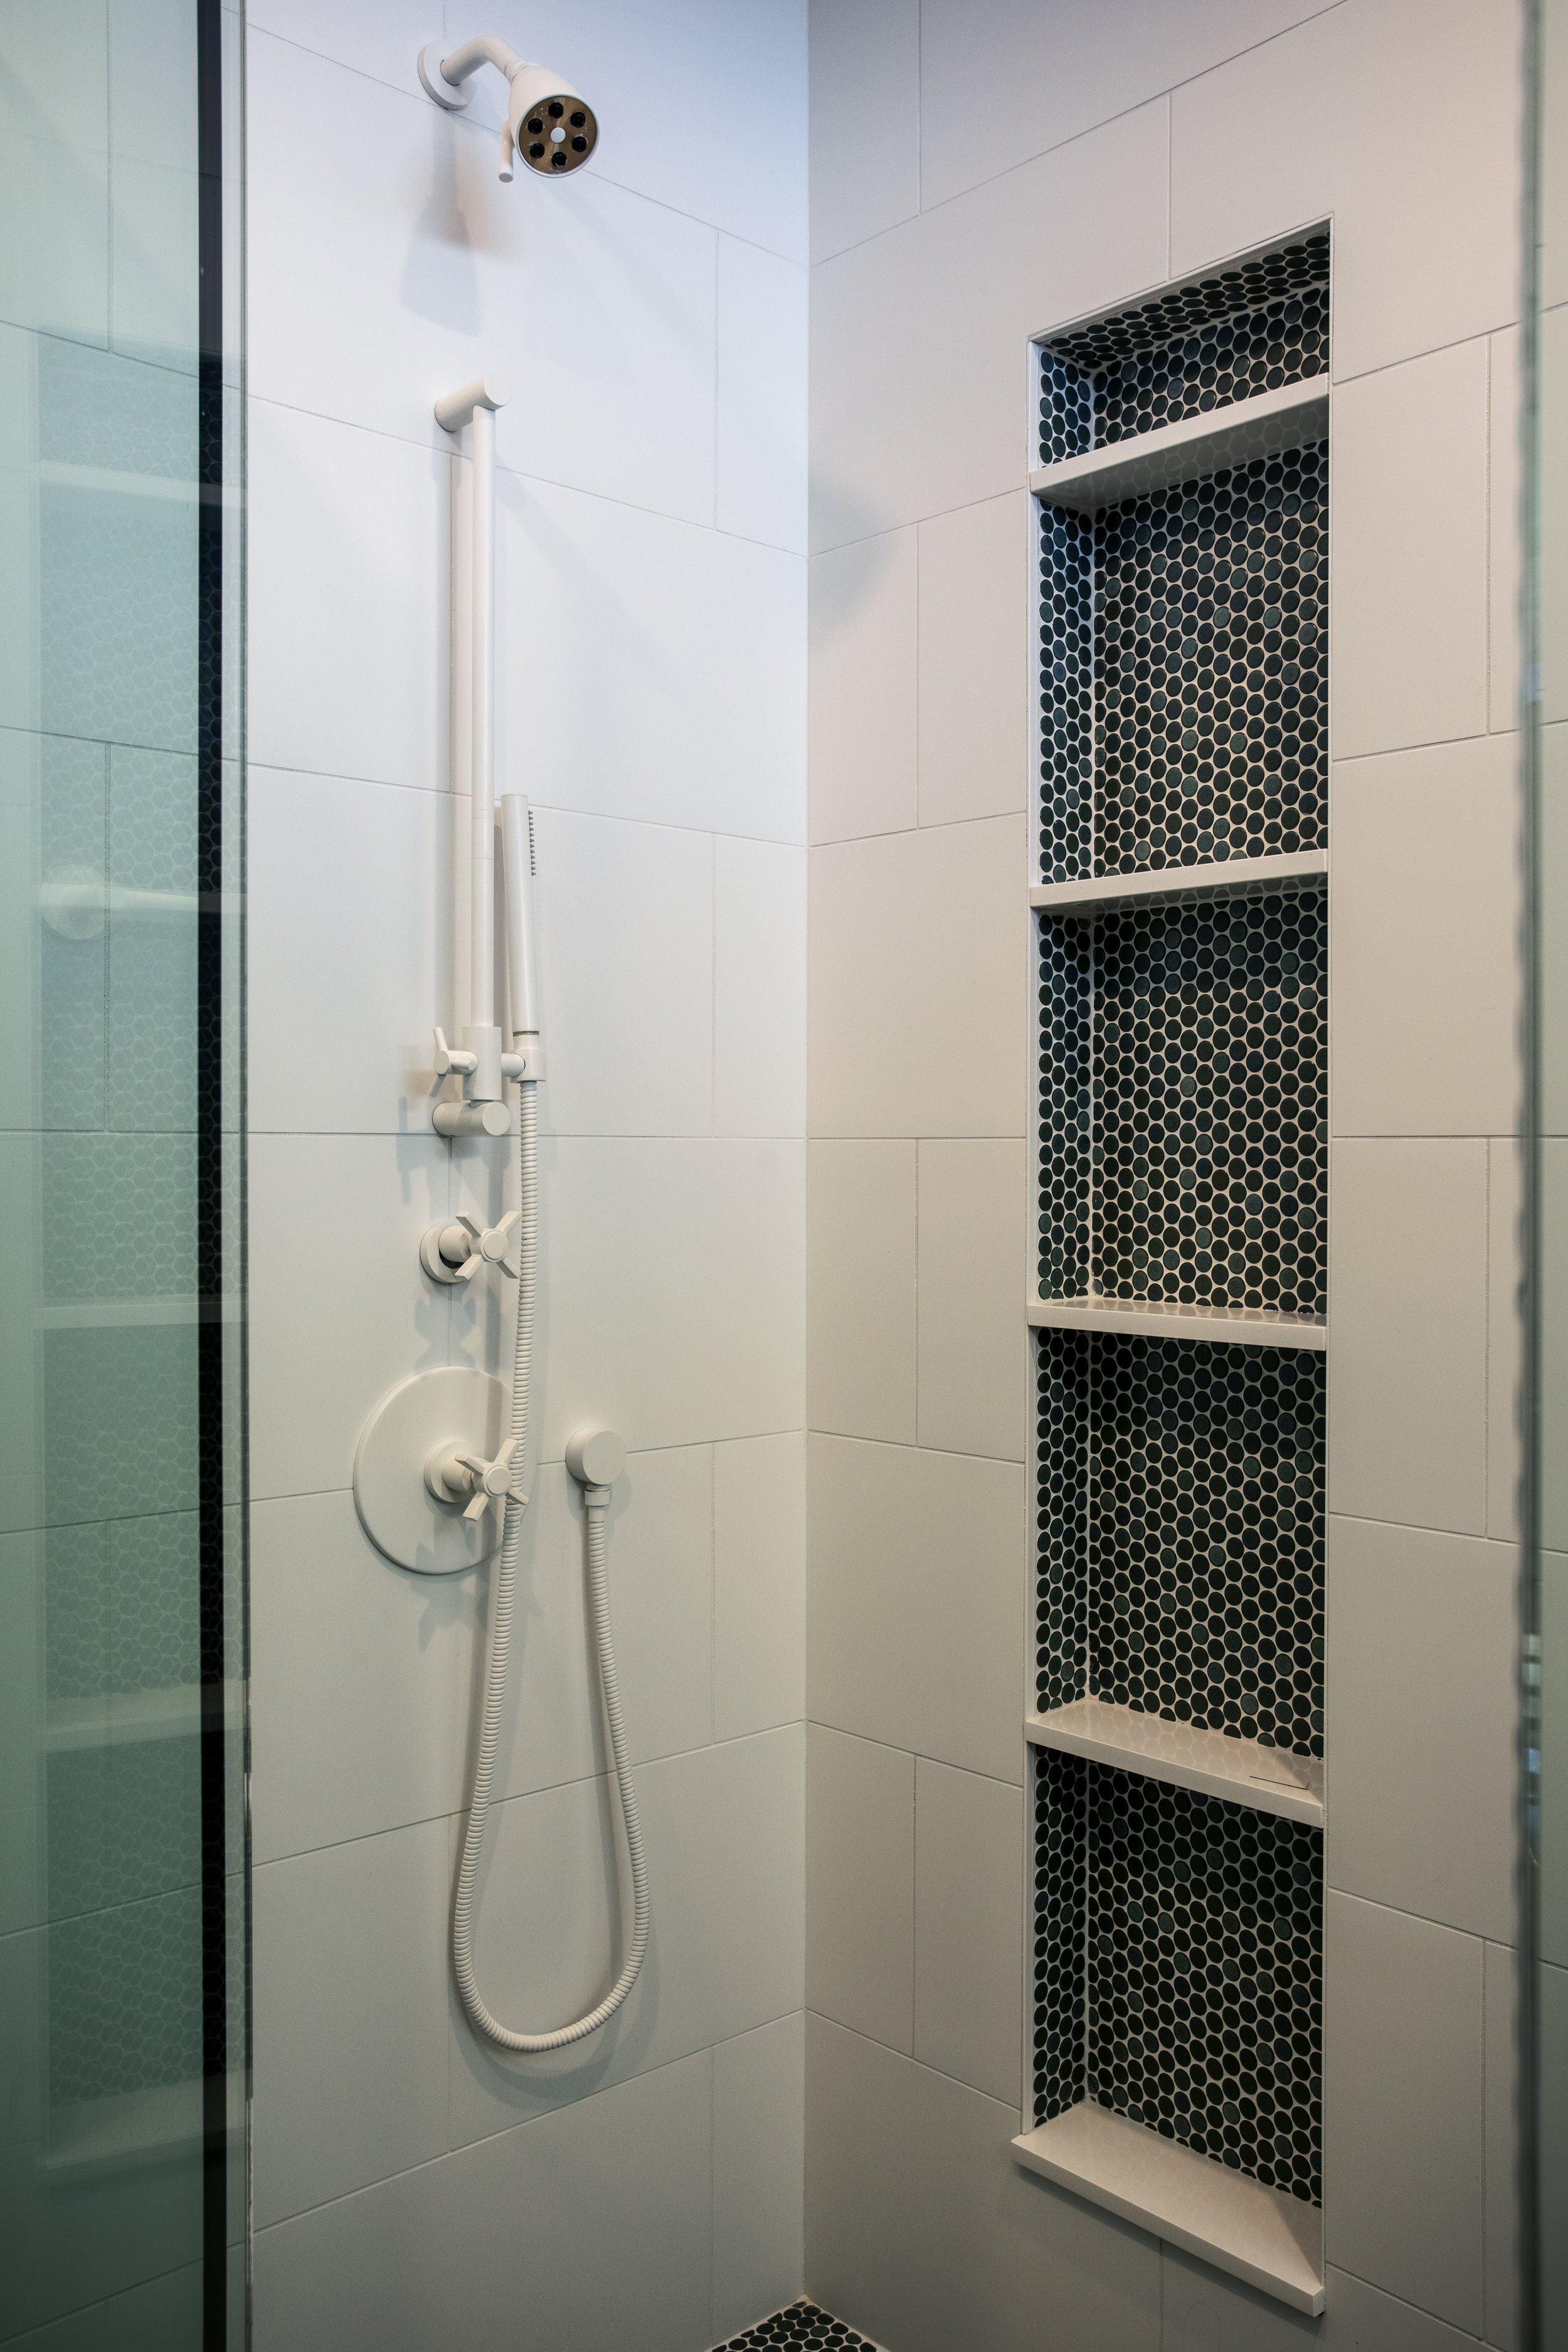 jack and jill shower.jpg